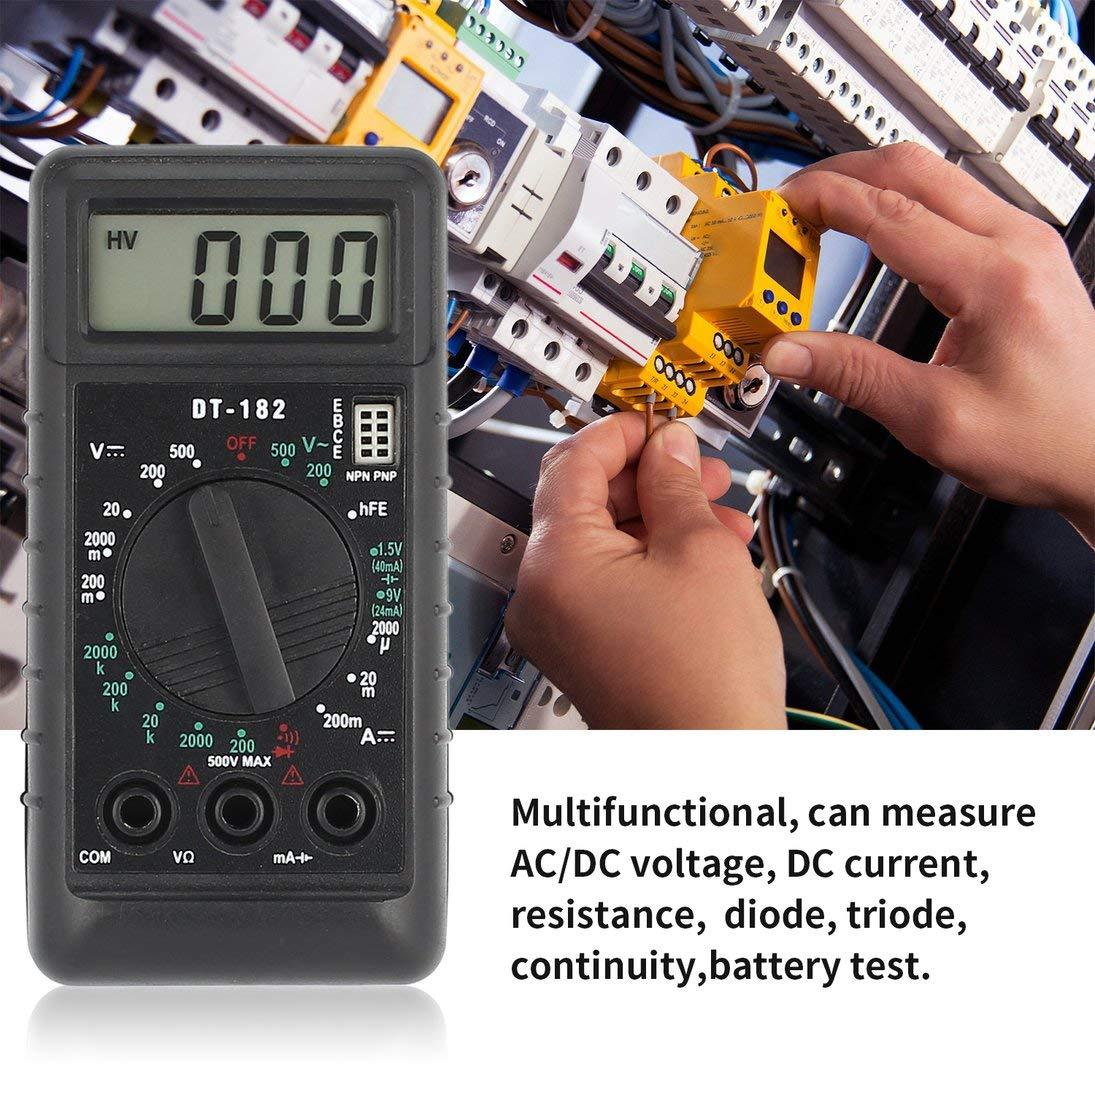 DT-182 Mini mult/ímetro digital Voltaje de CC//CA Medidor de corriente Volt/ímetro de bolsillo de mano Amper/ímetro Diodo Triodo Tester Multitester ToGames-ES